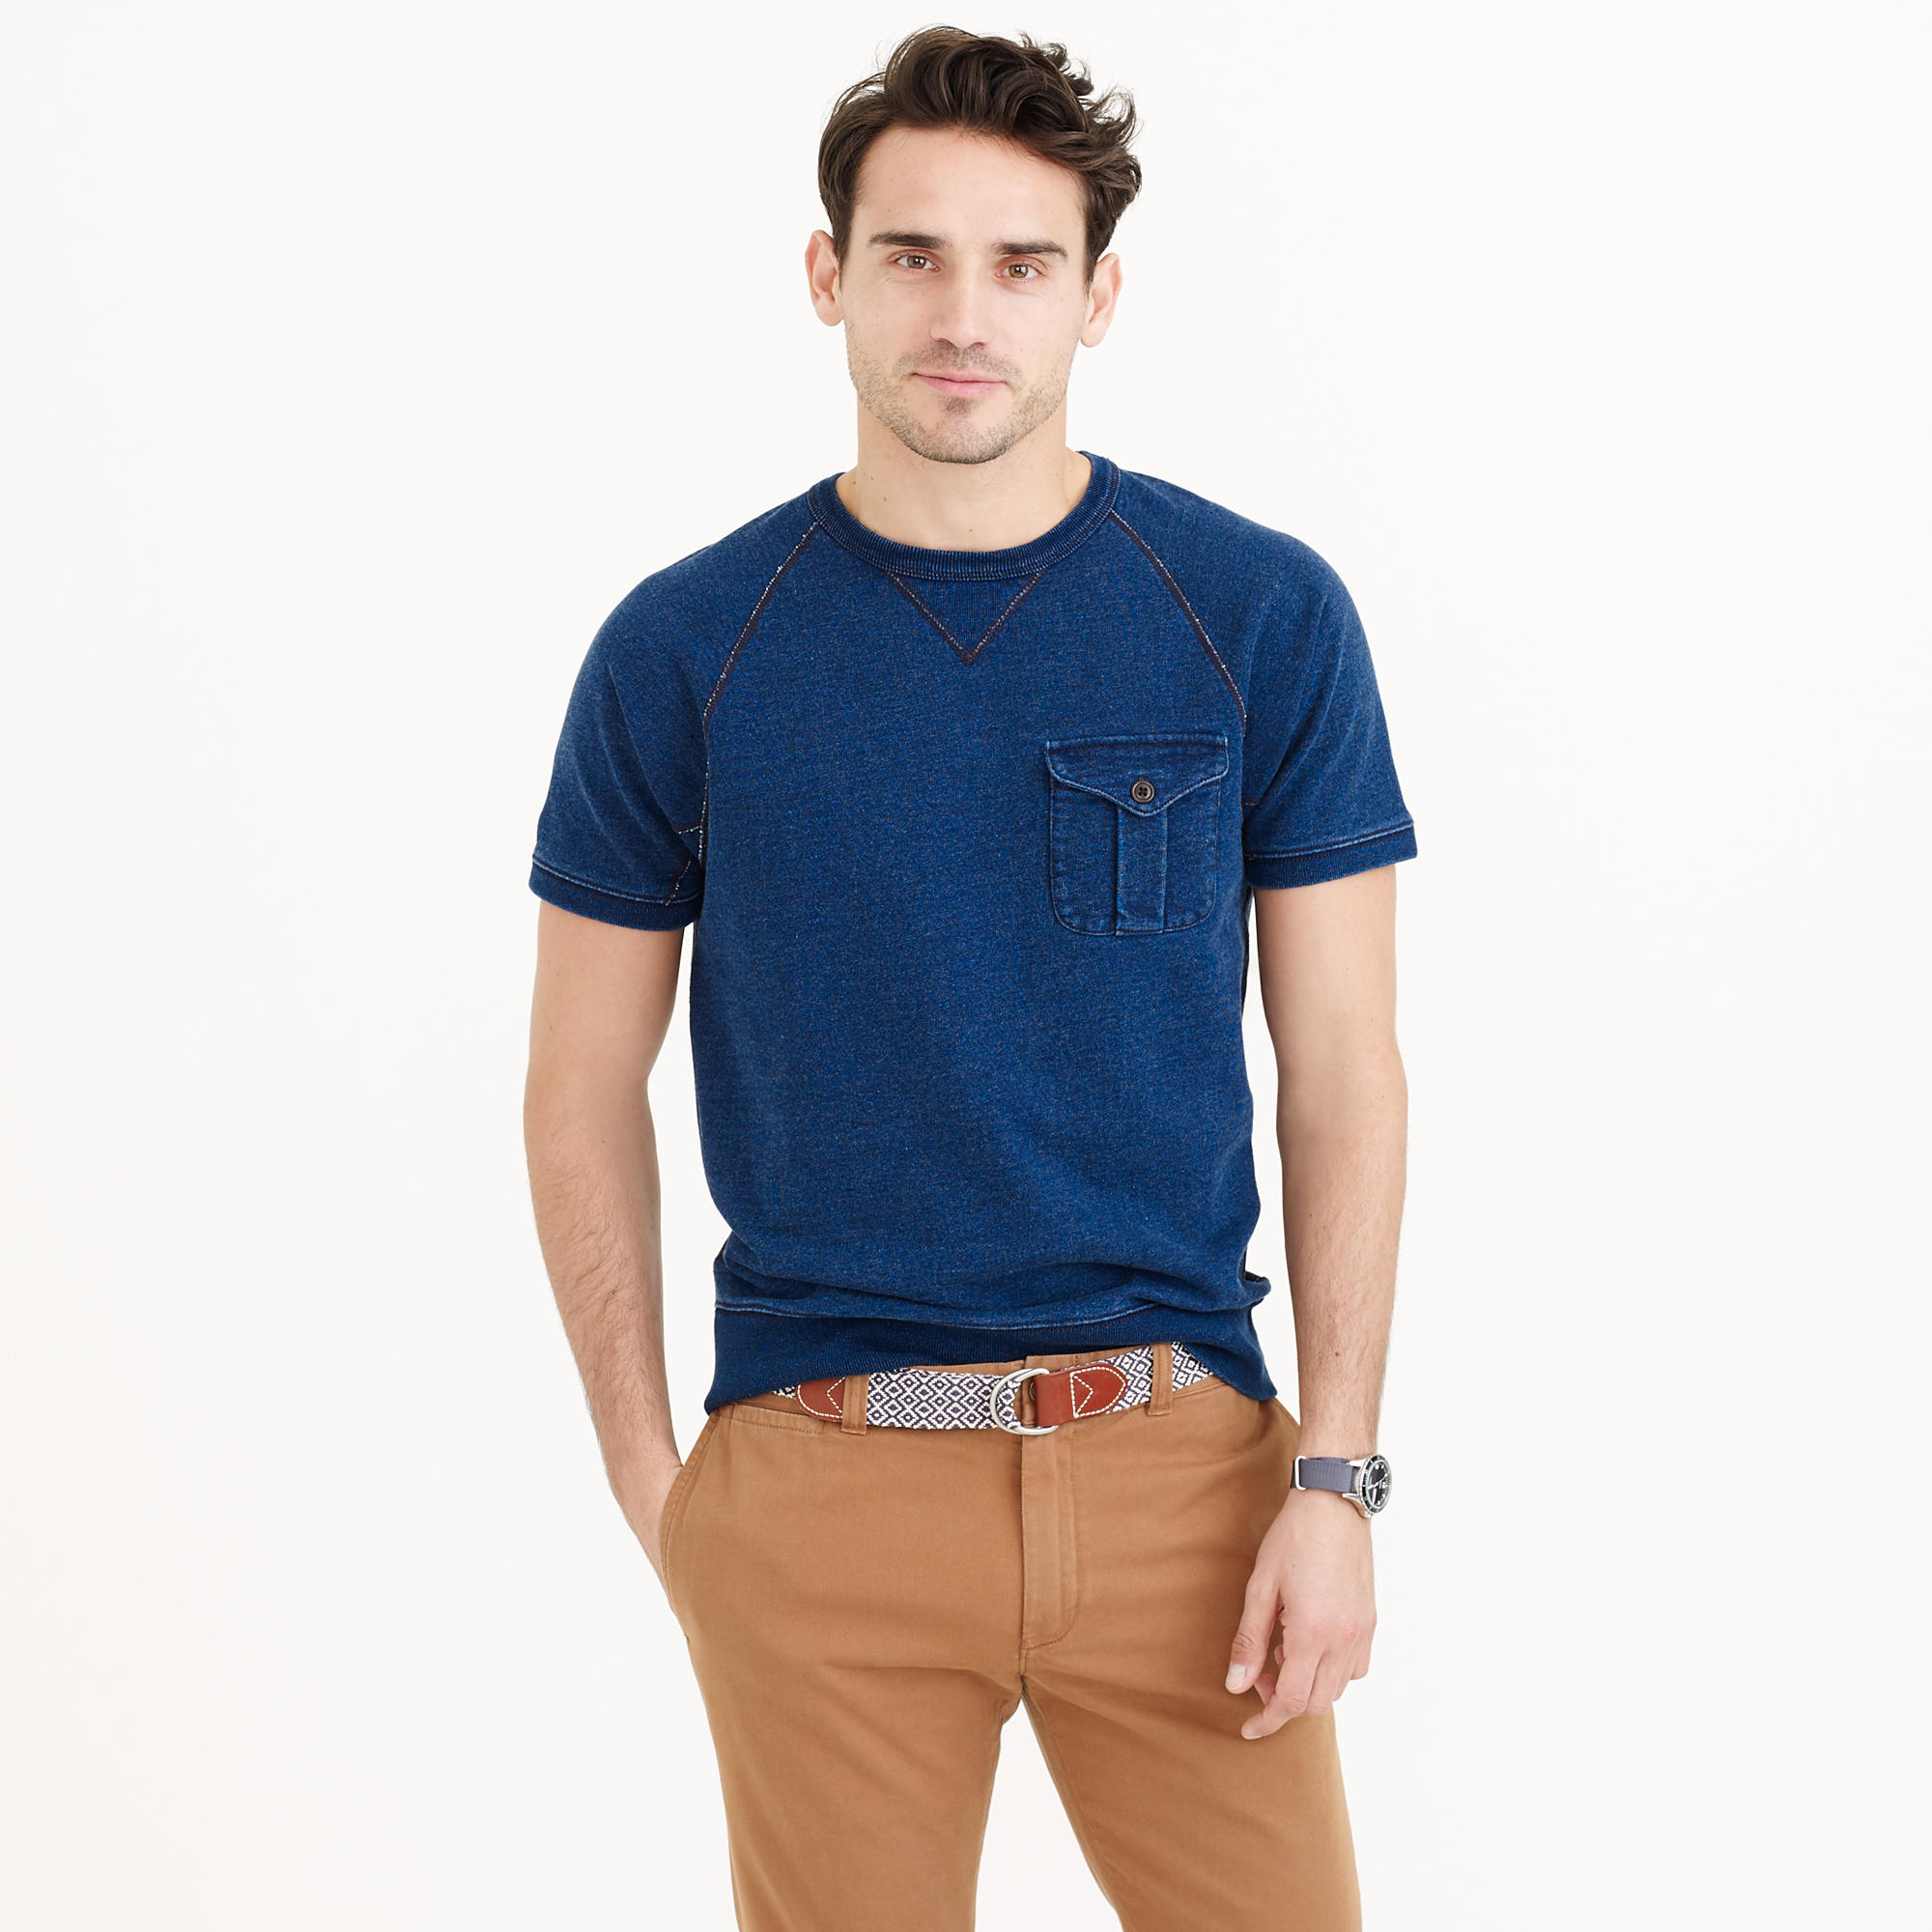 J.crew Wallace & Barnes Short-sleeve Indigo Sweatshirt in Blue for ...